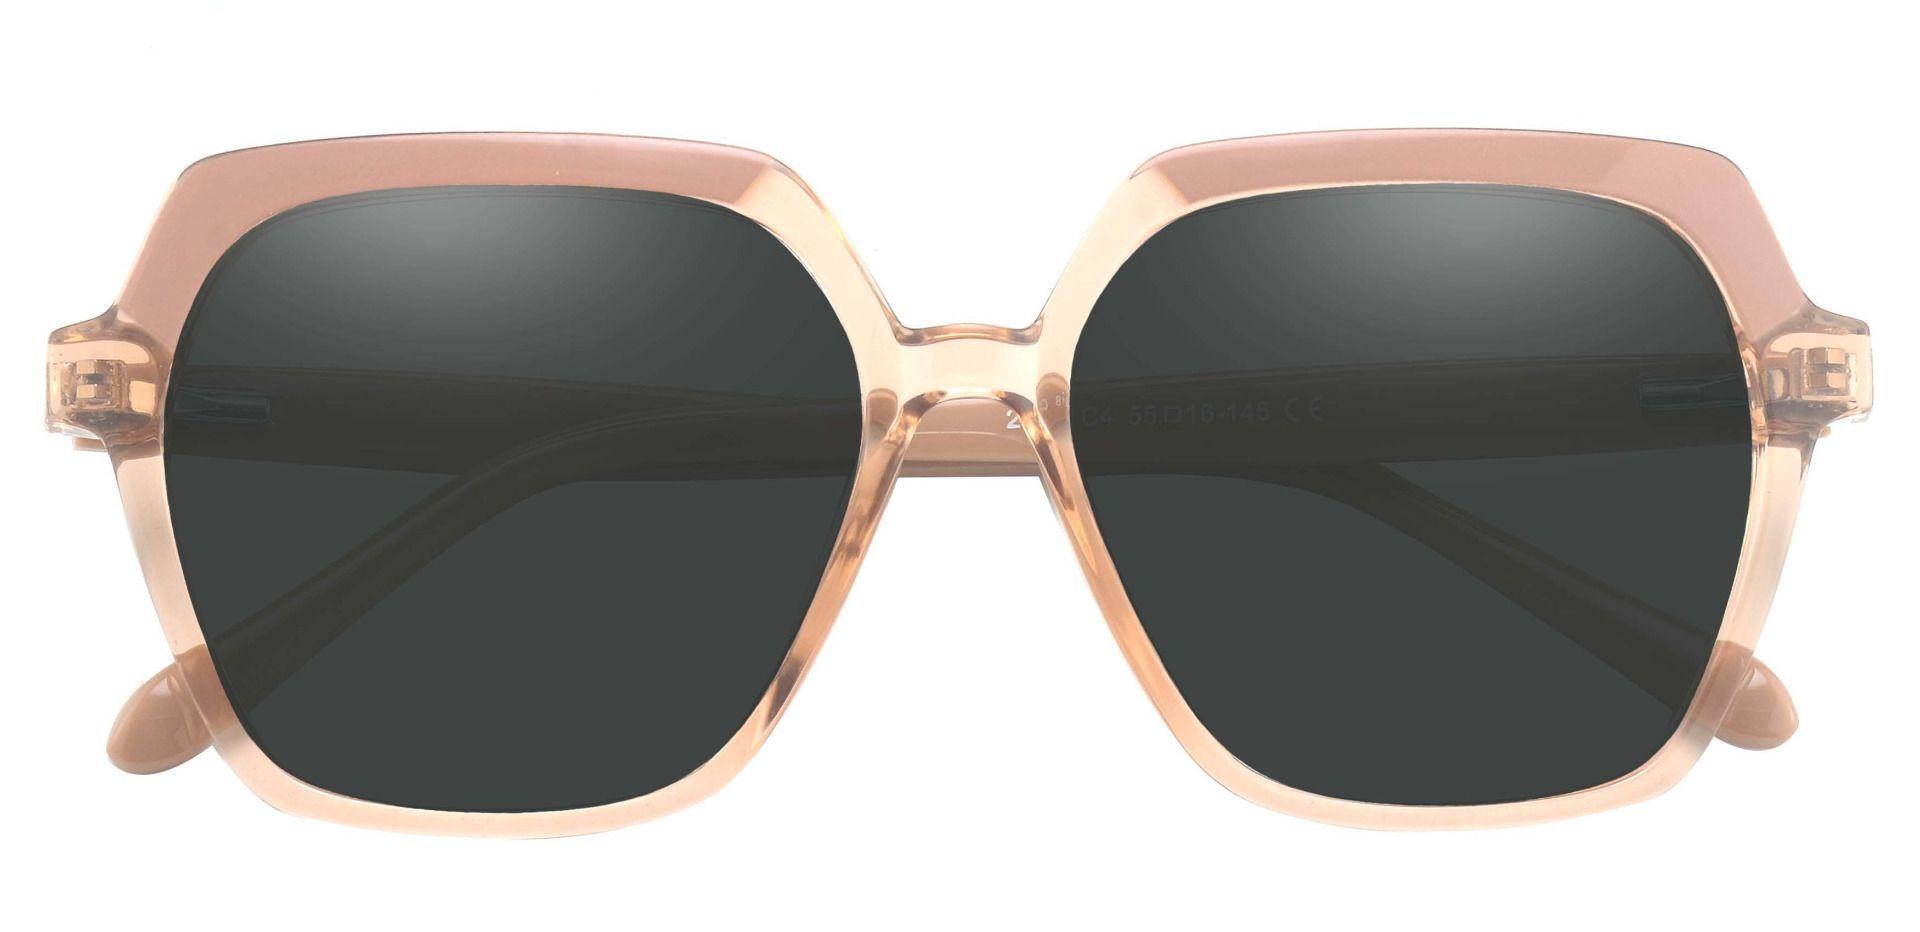 Regent Geometric Progressive Sunglasses - Brown Frame With Gray Lenses